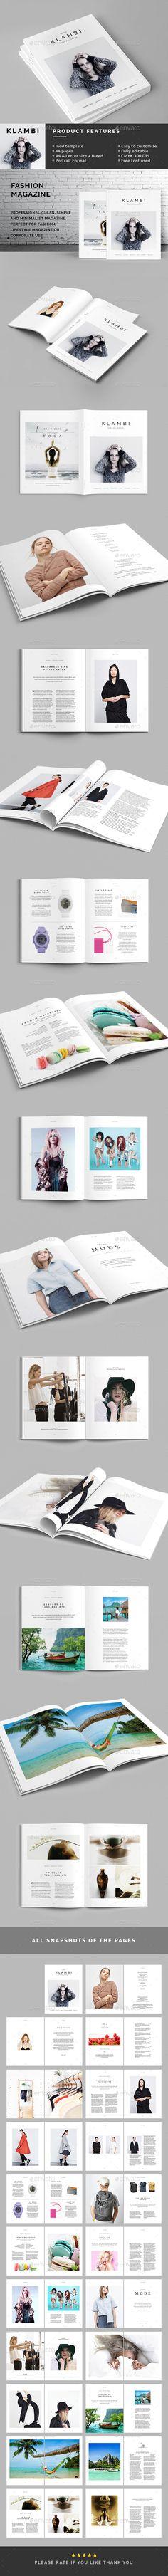 Fashion Magazine Template  Magazines Print Templates #minimal #clean